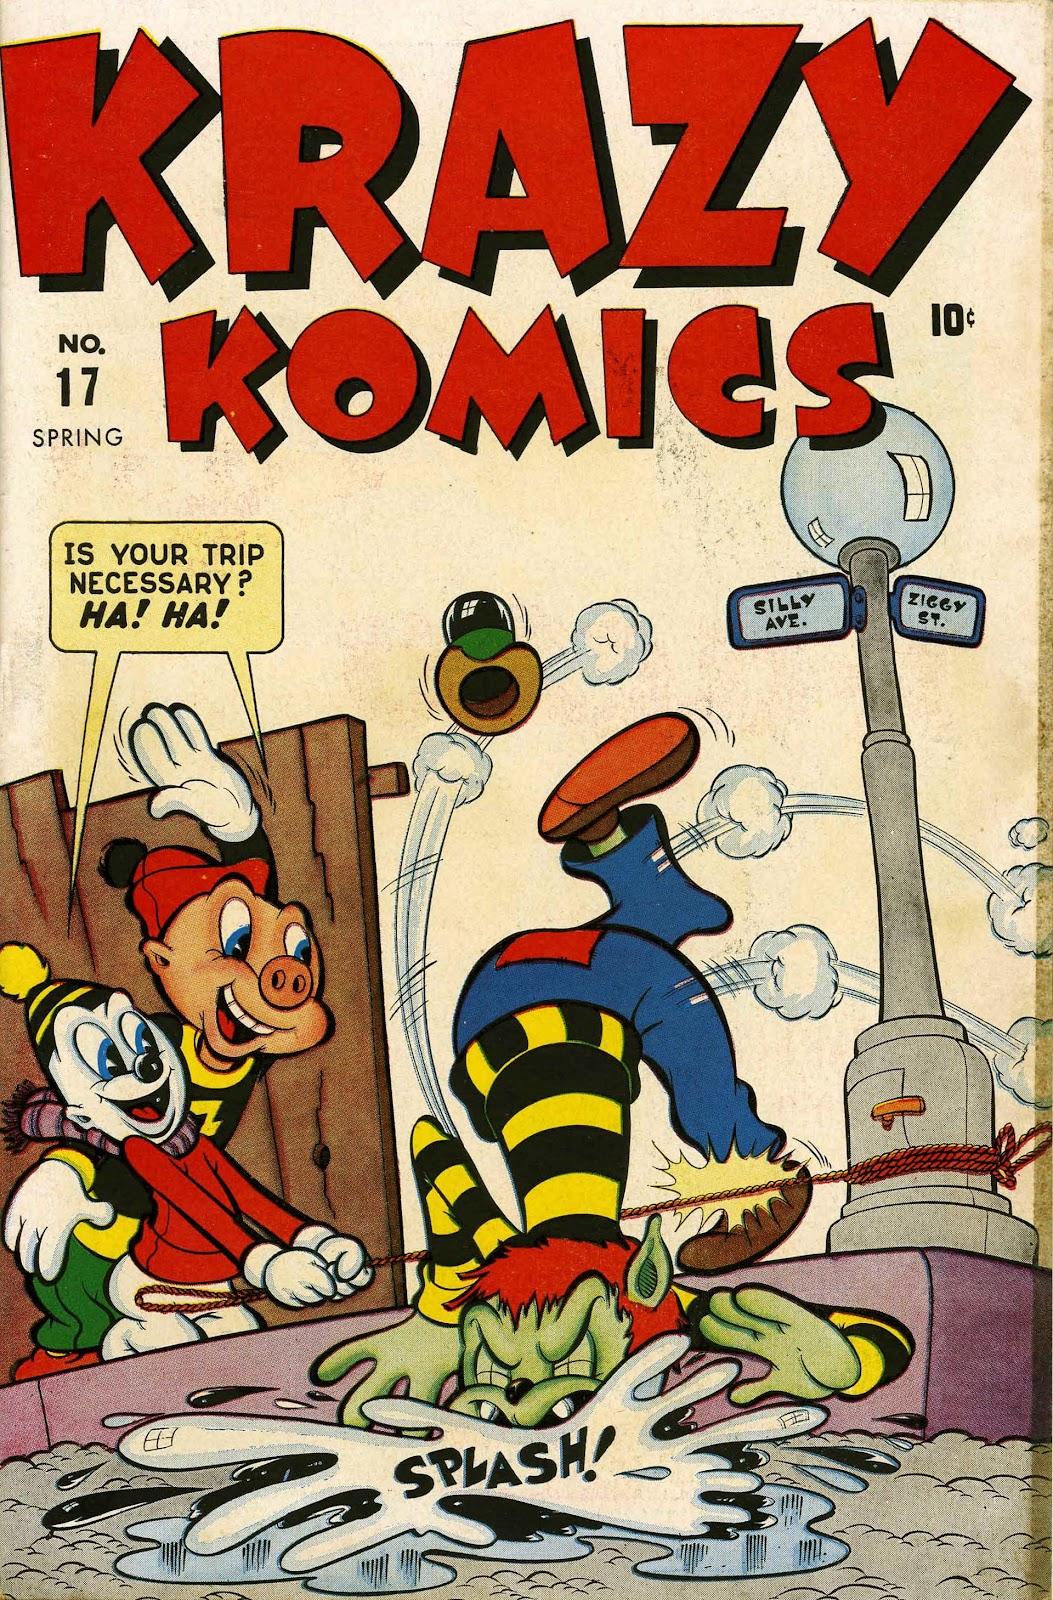 Krazy Komics issue 17 - Page 1